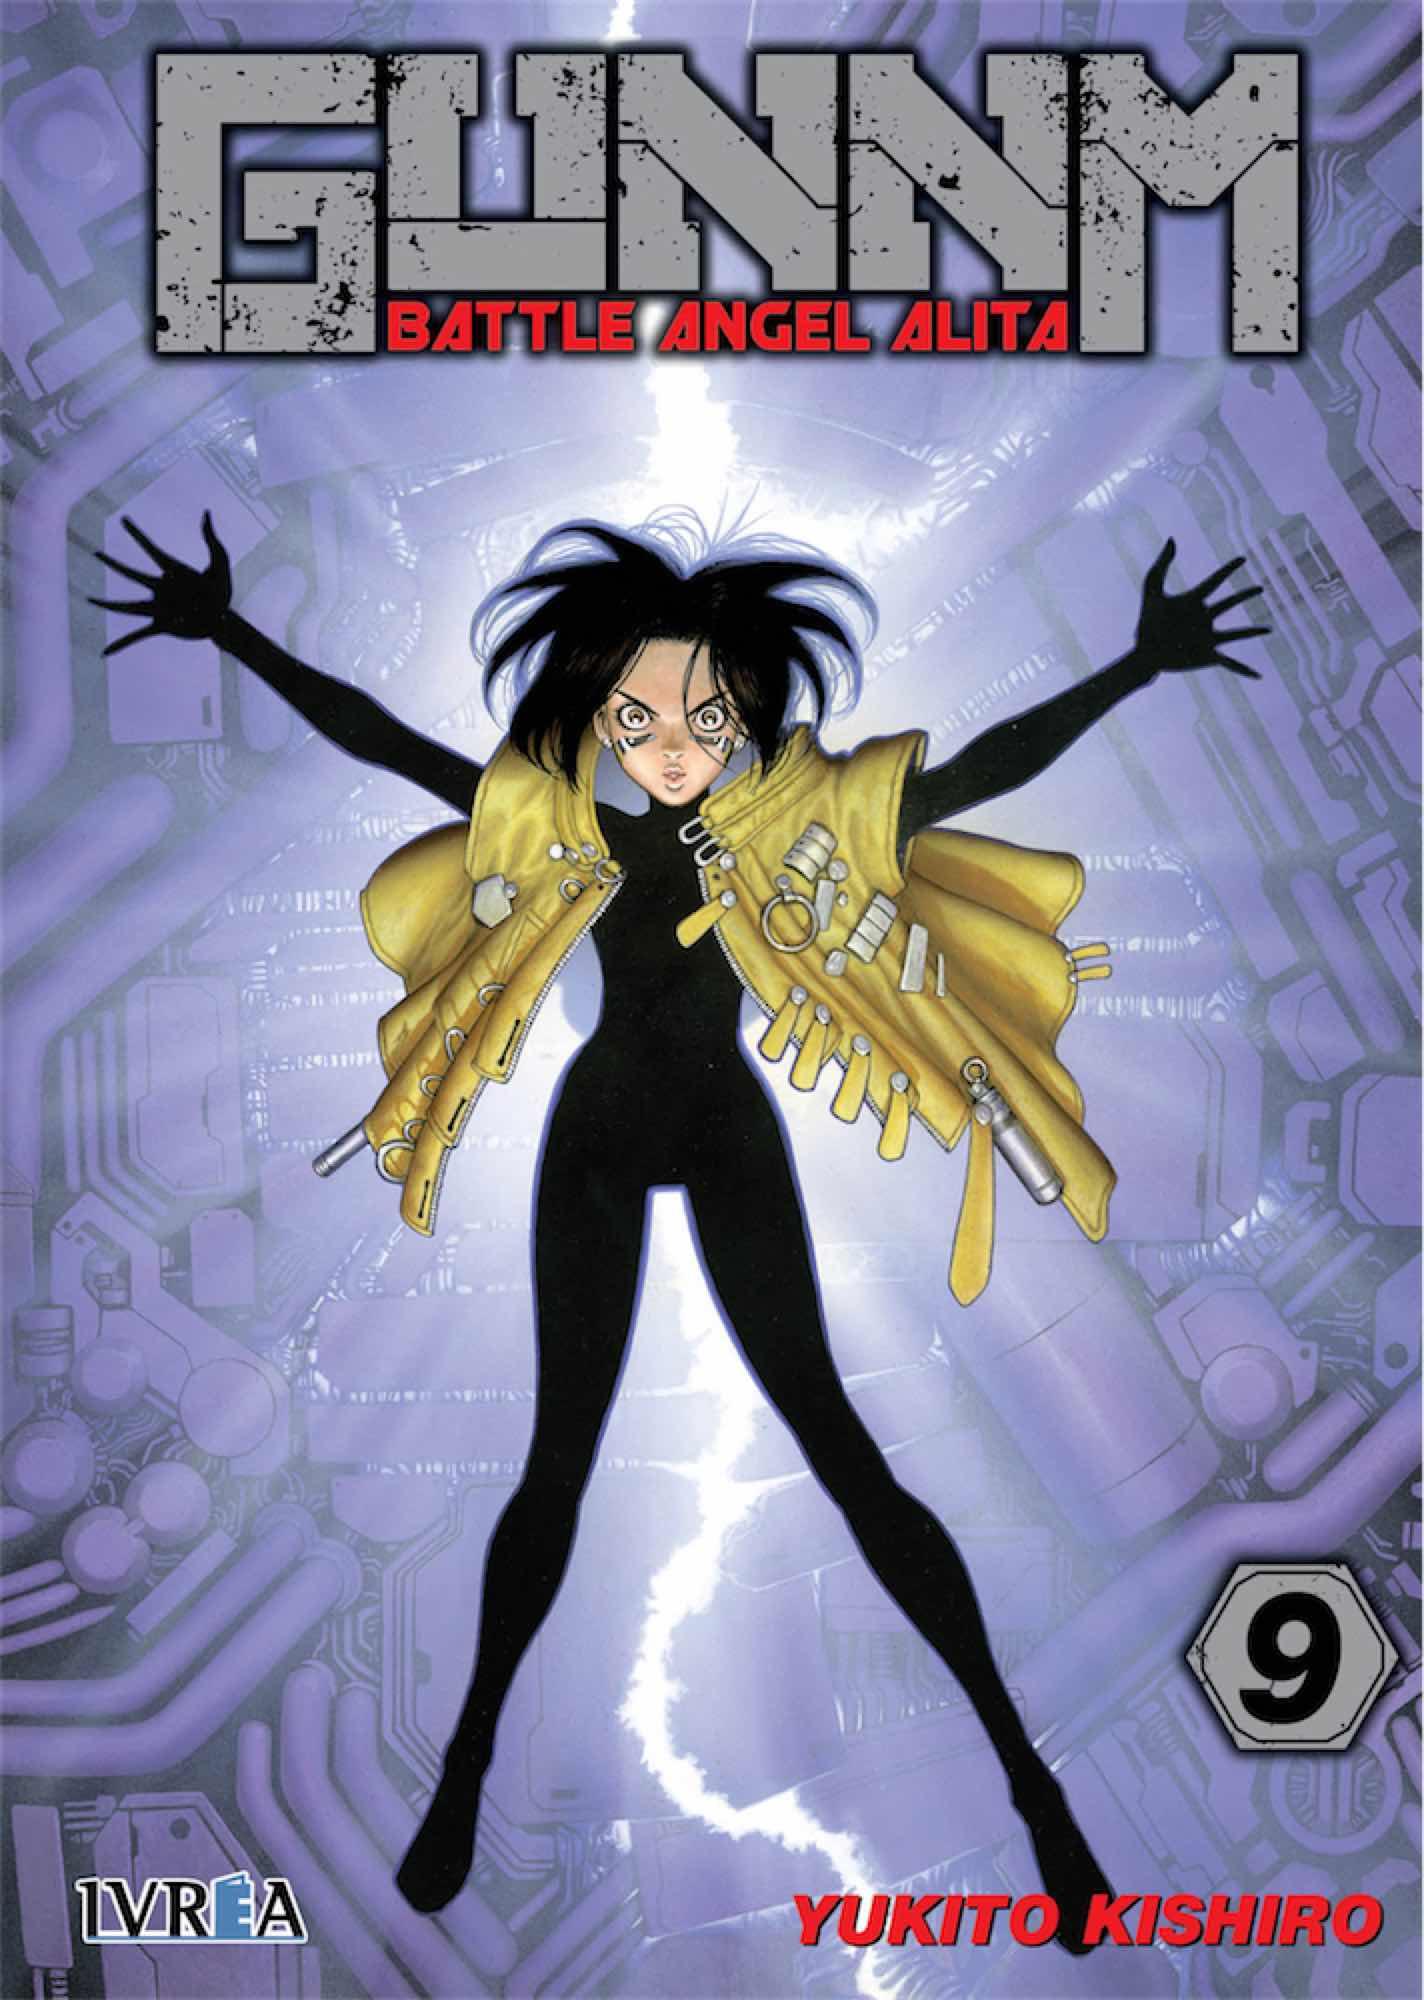 GUNNM (BATTLE ANGEL ALITA) 09